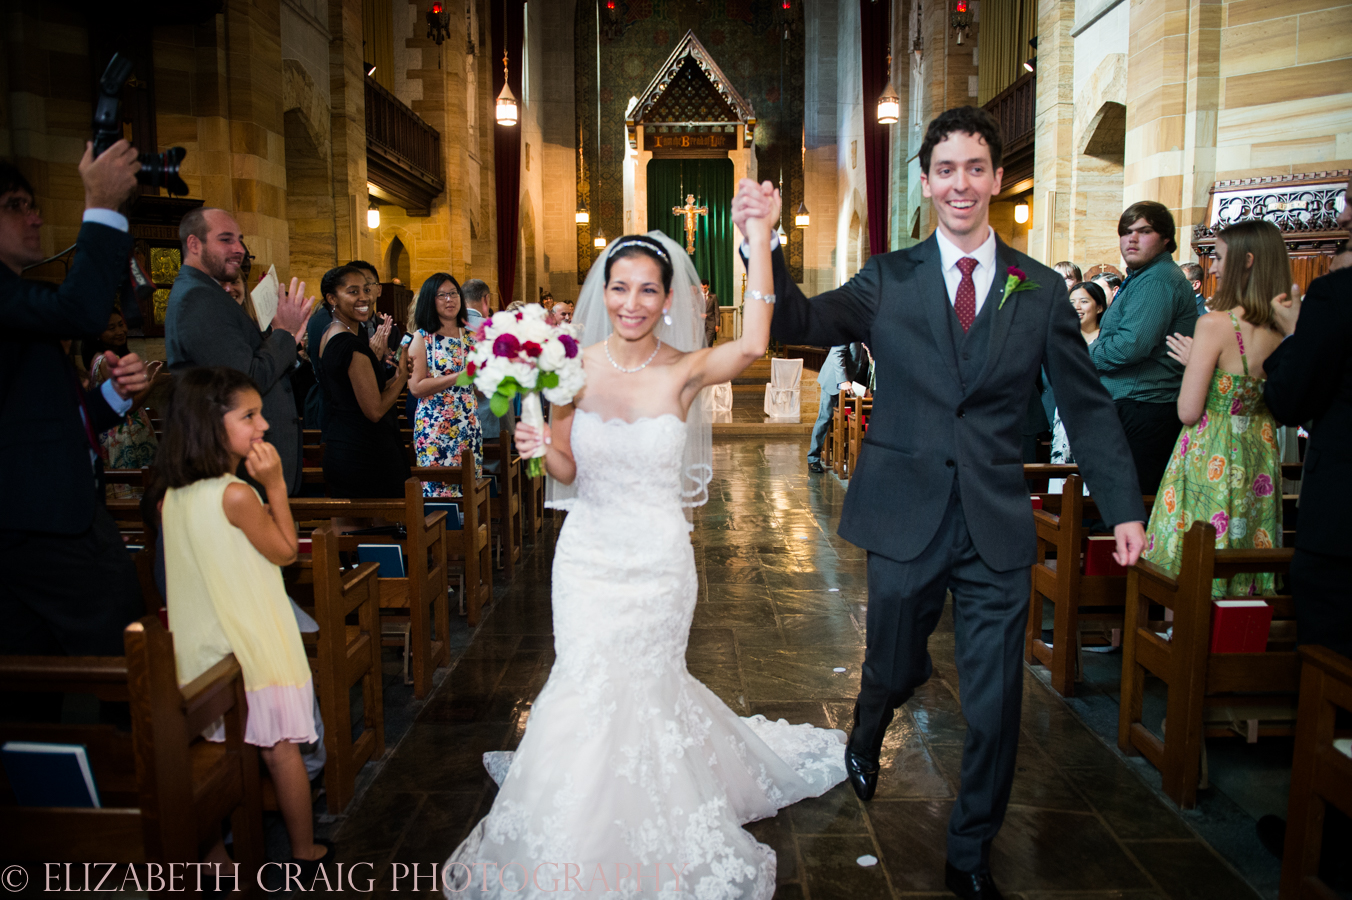 pittsburgh-wedding-photographers-doubletree-pittsburgh-sacred-heart-elizabeth-craig-photography-21